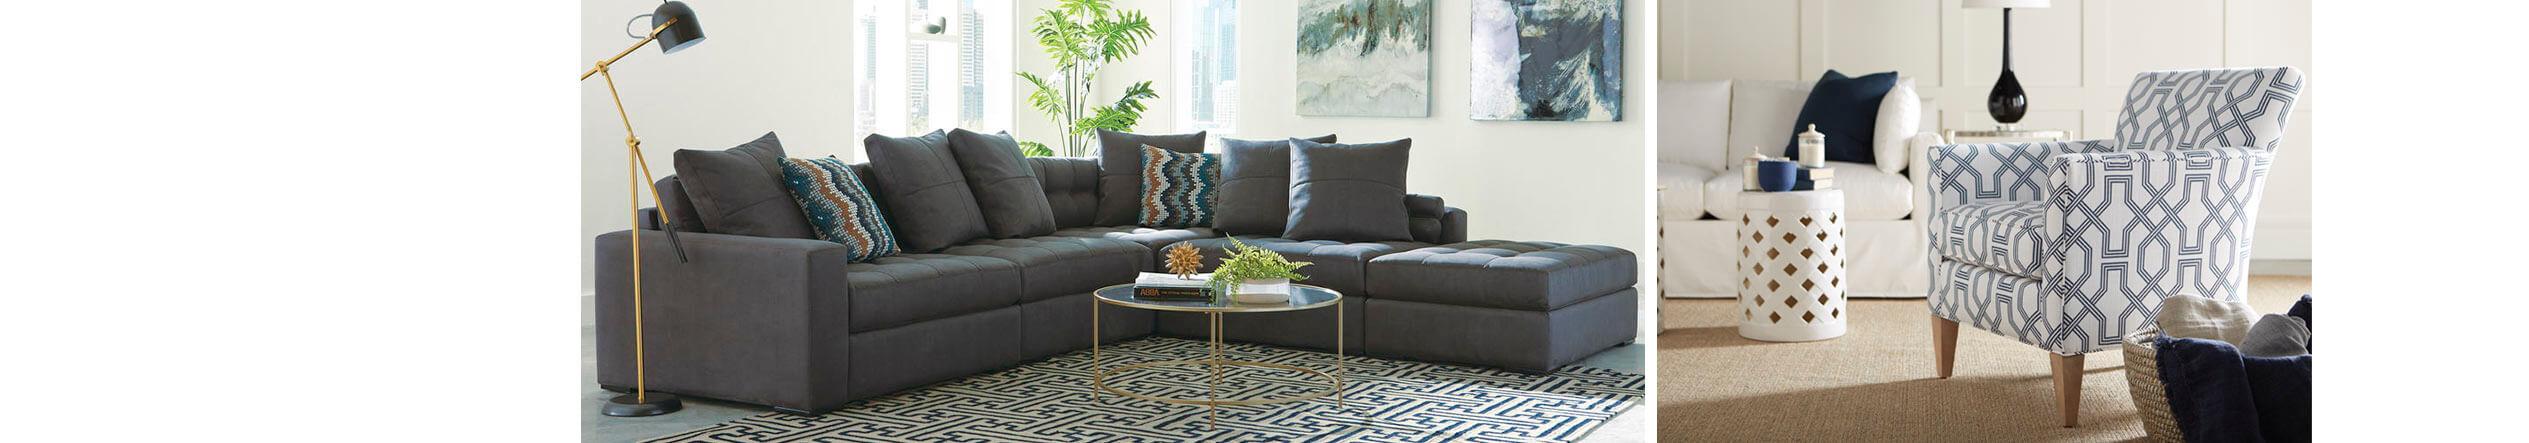 Customizable Furniture